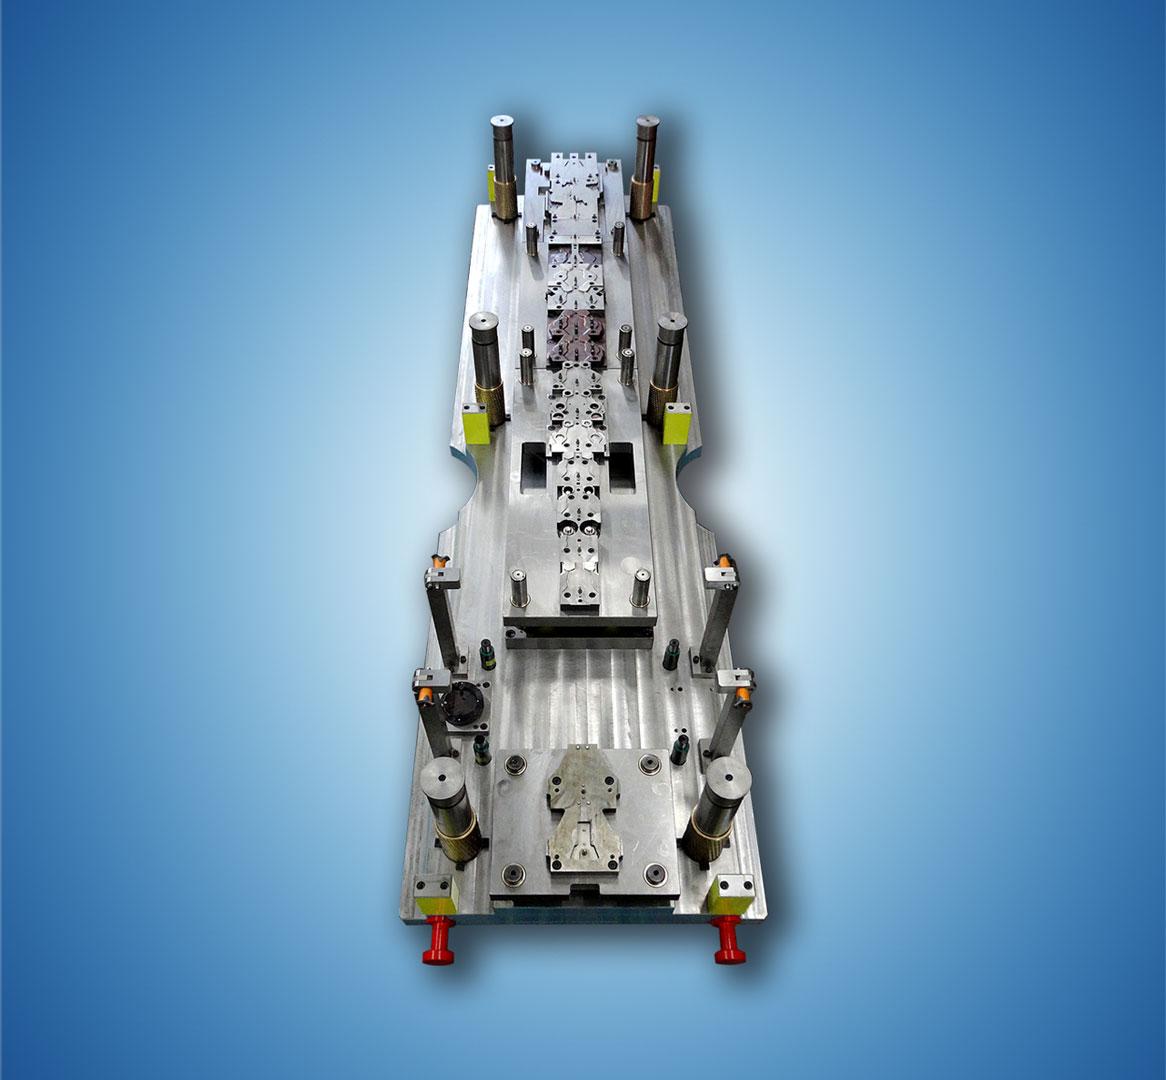 Ero-Projekt-d.o.o.-Toolshop-Werkzeugbau-3-Orodje-za-preoblikov--plocevine-_-slika-4